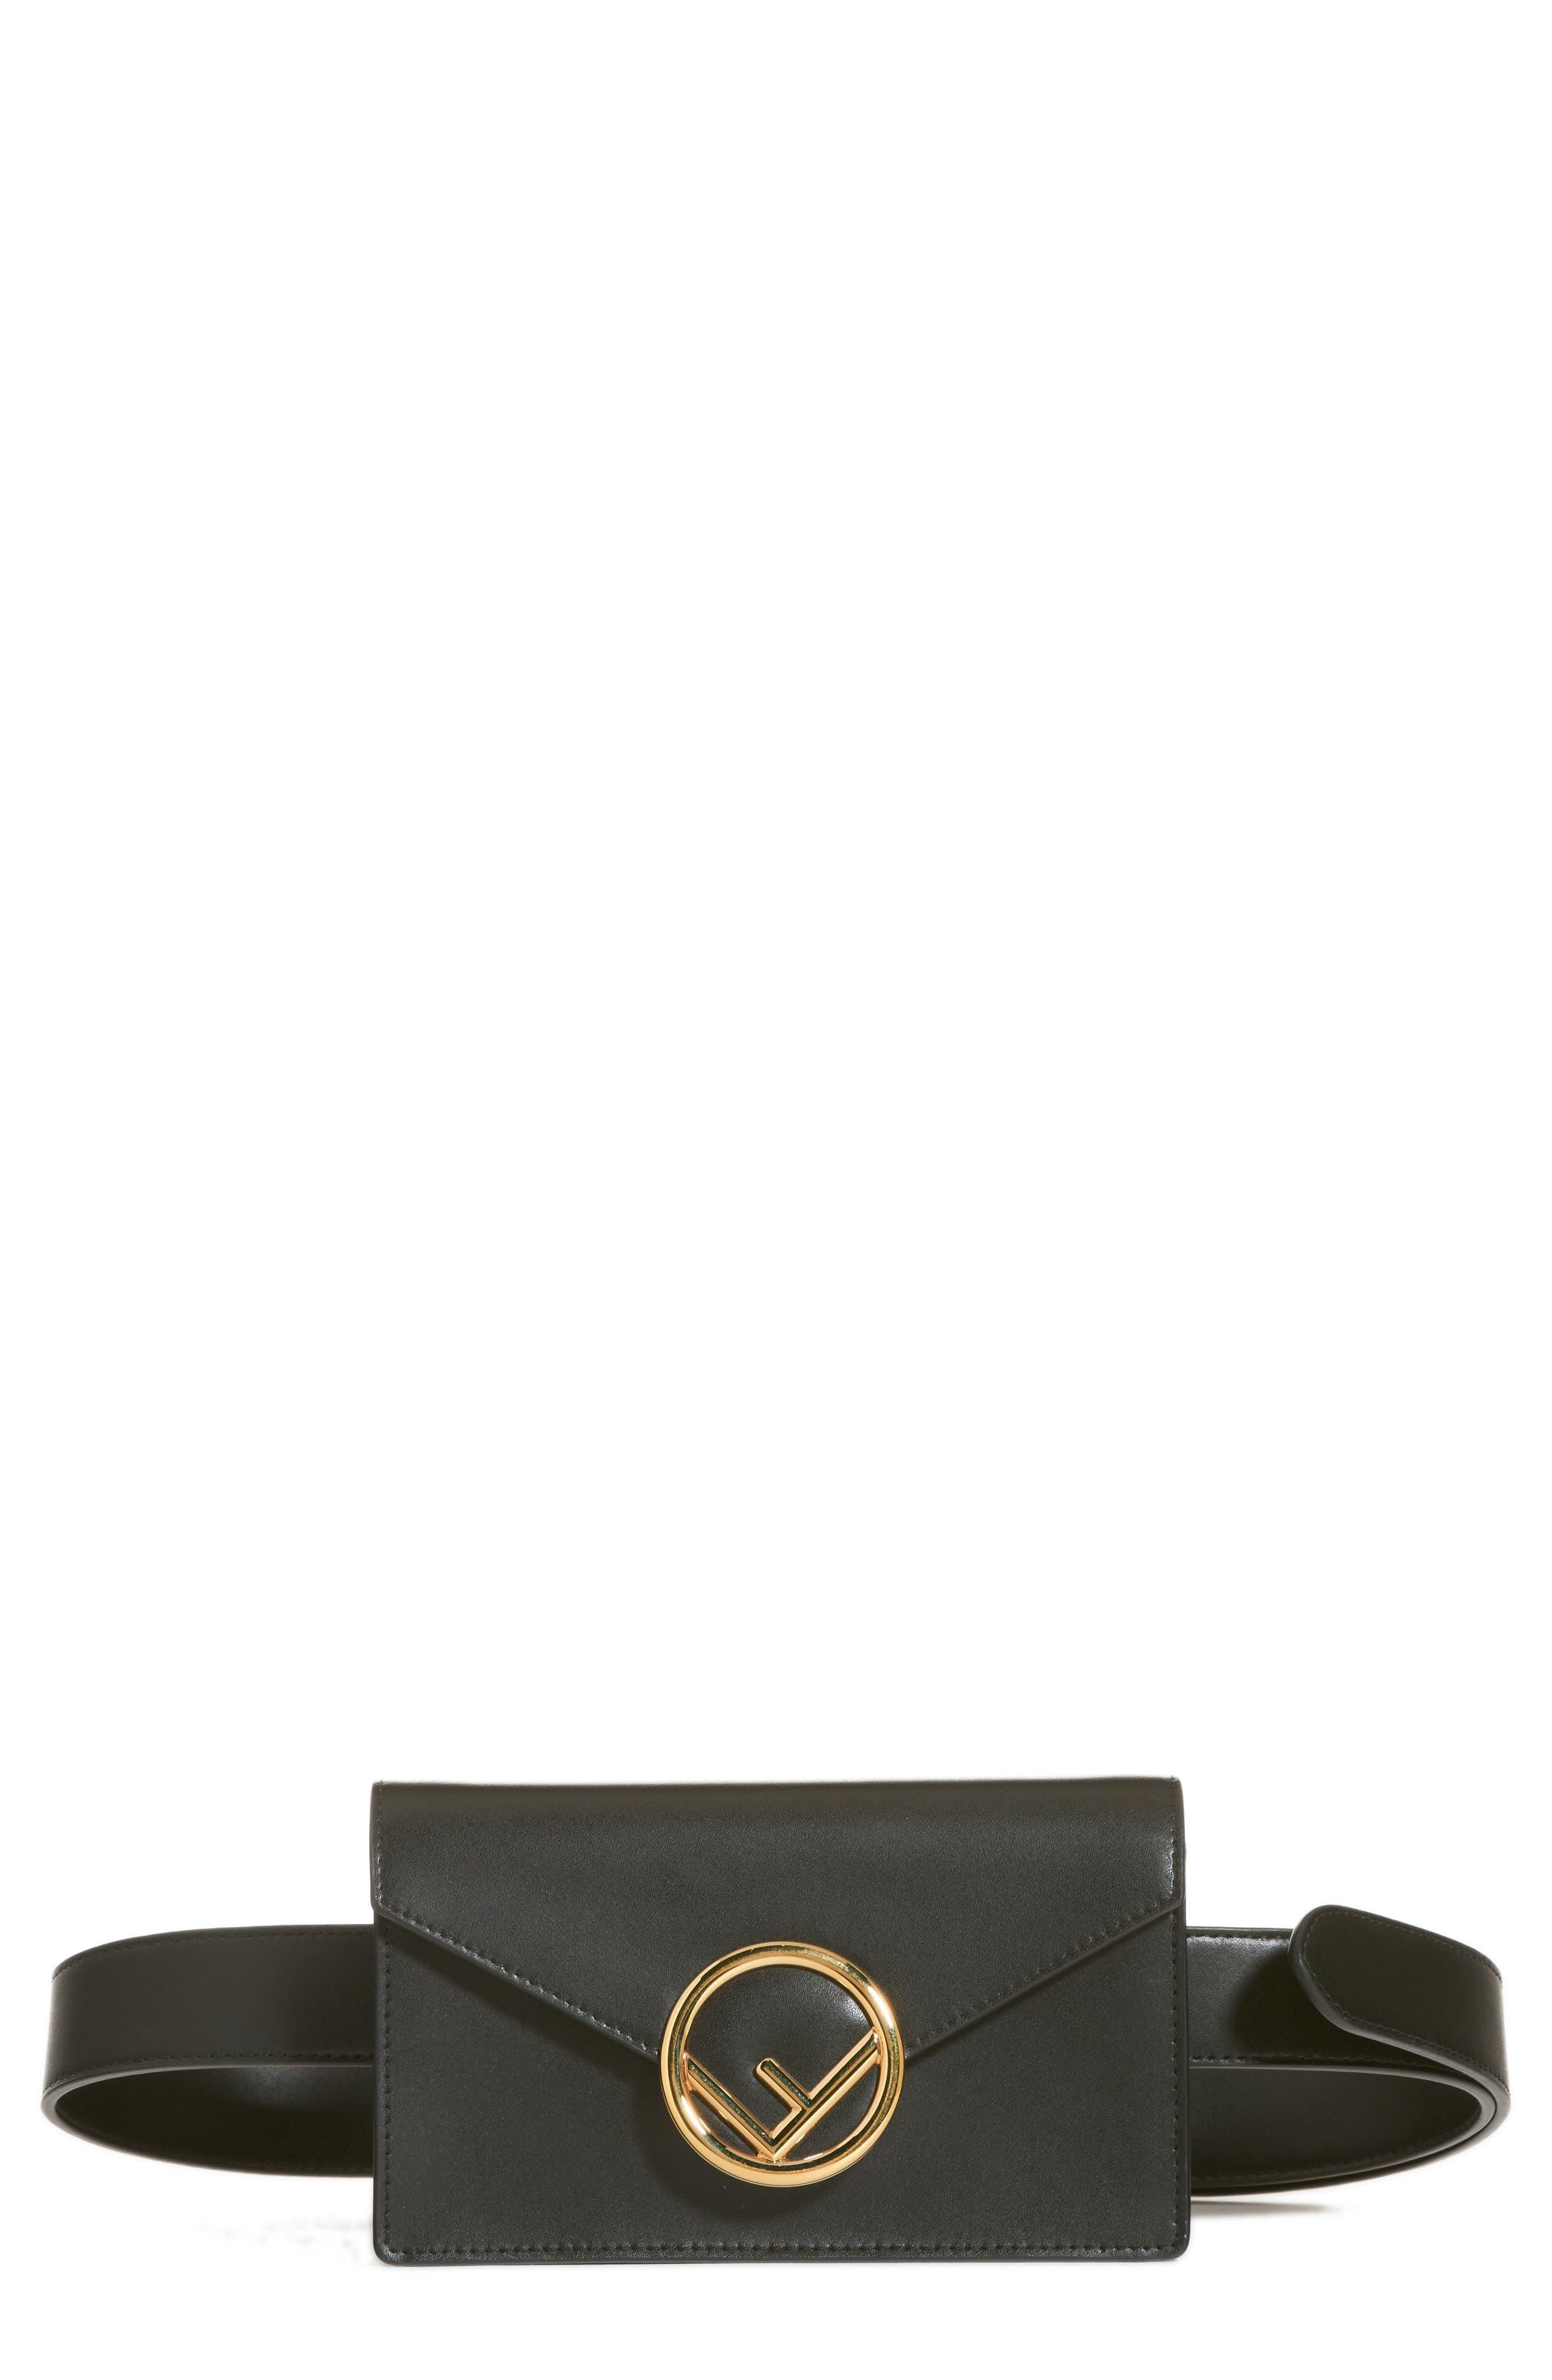 Liberty Logo Calfskin Leather Belt Bag,                         Main,                         color, NERO/ ORO SOFT